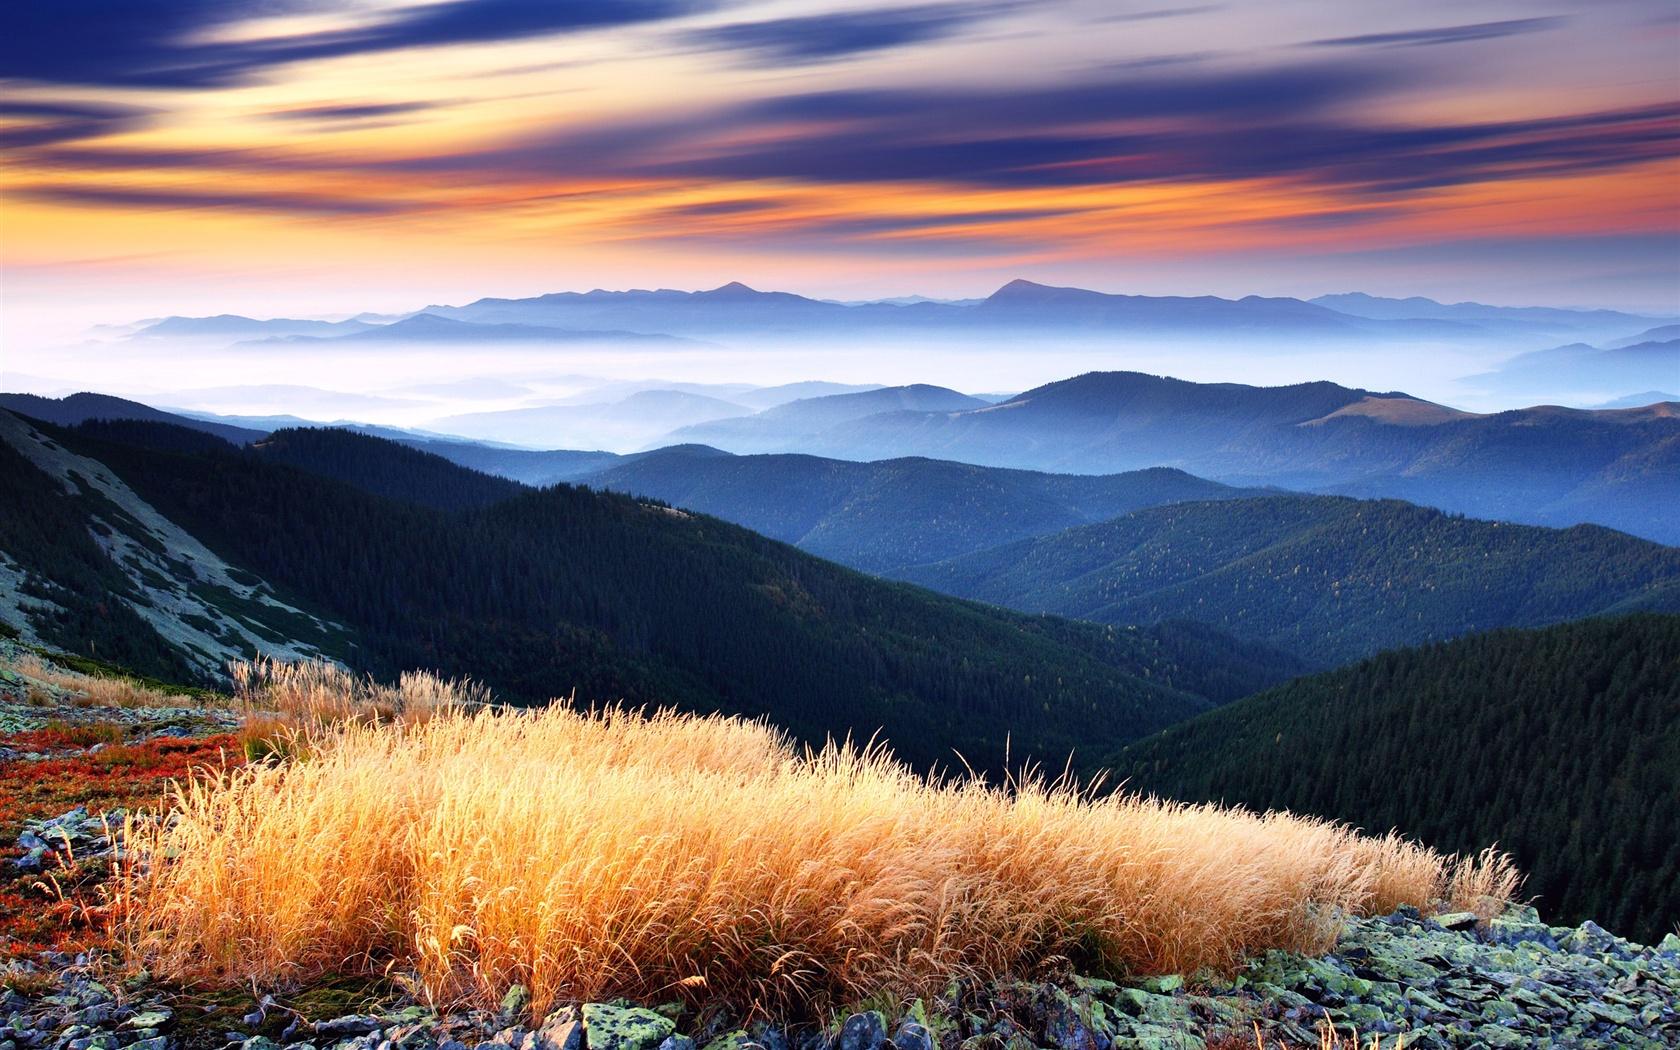 Mountains beautiful scenery Wallpaper | 1680x1050 ...